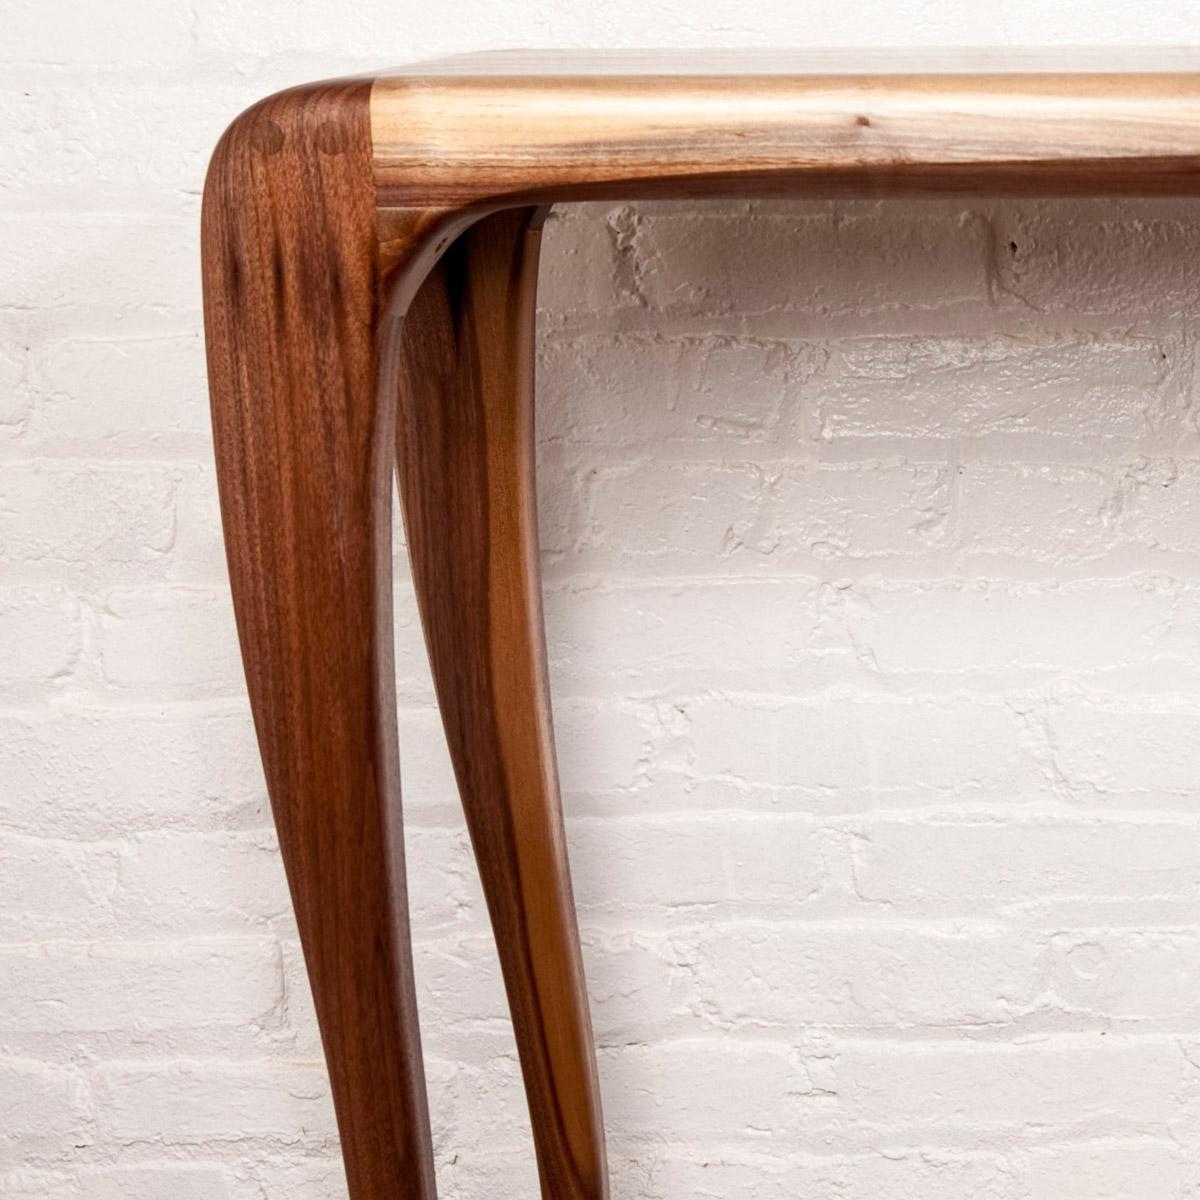 Caleb-Woodard-Hayworth-Side-Table_2.jpg